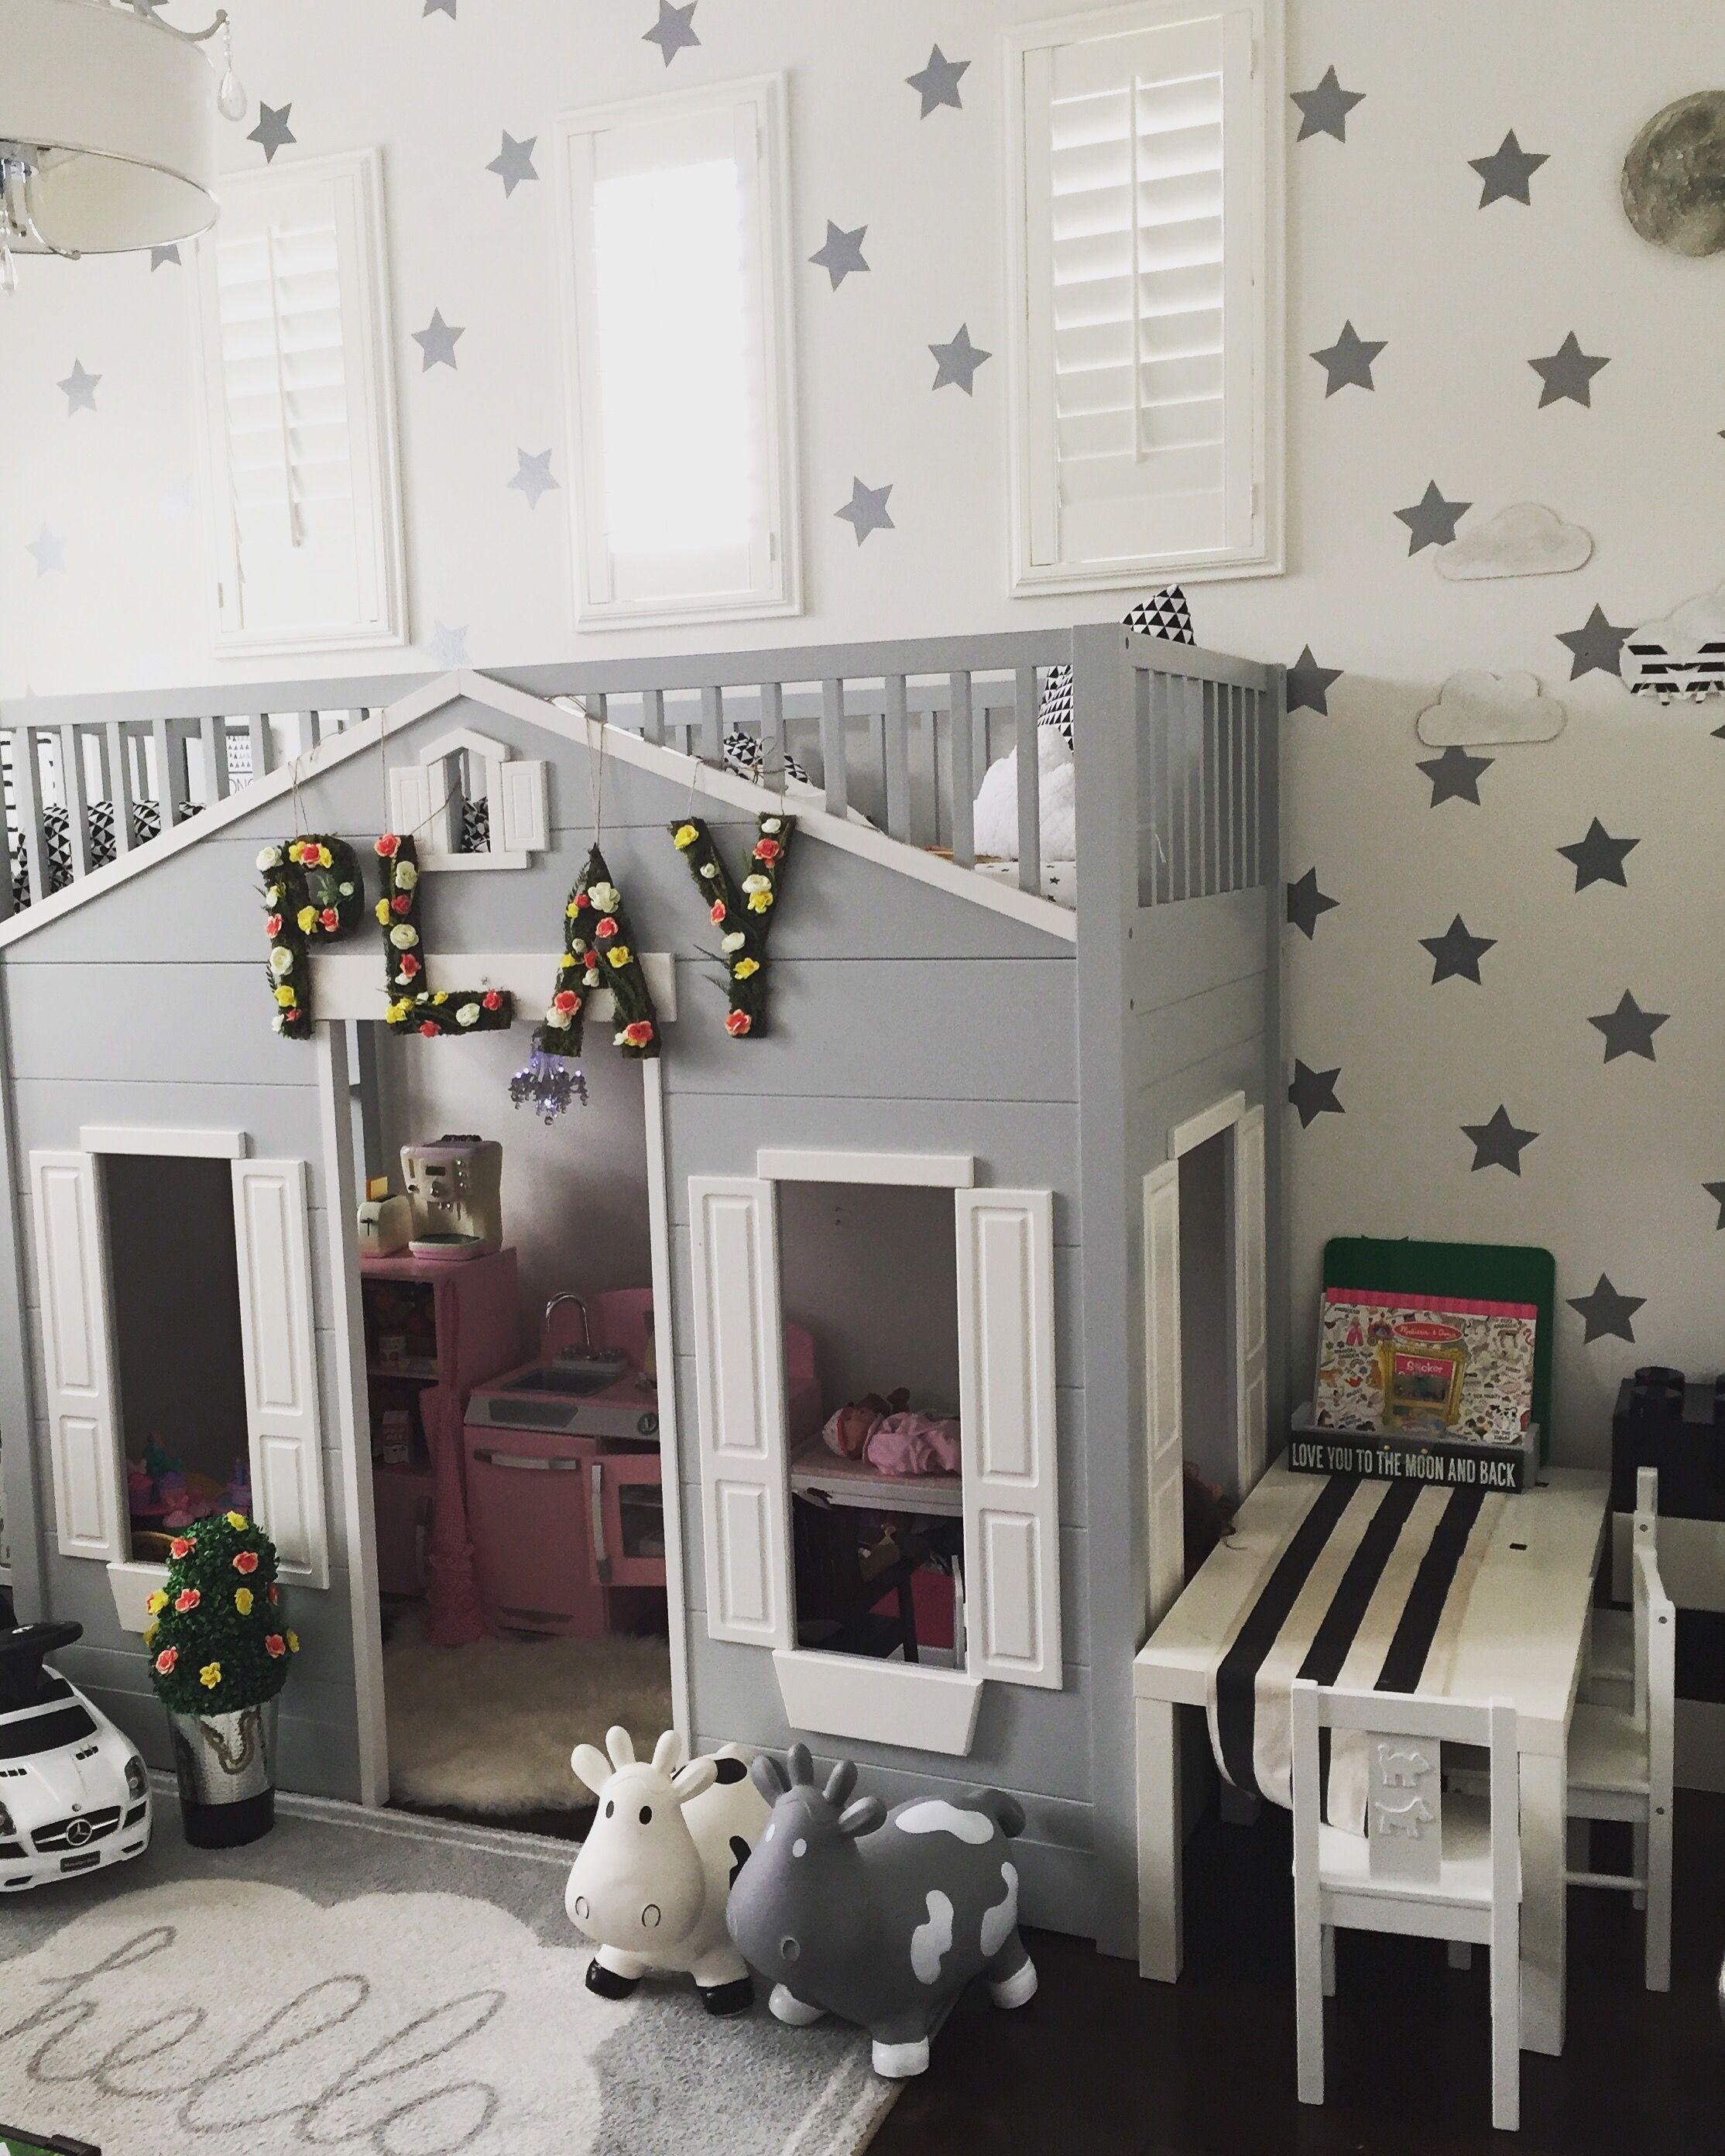 Loft bed organization ideas  Playroom Organization decor nursery kids decor  My house